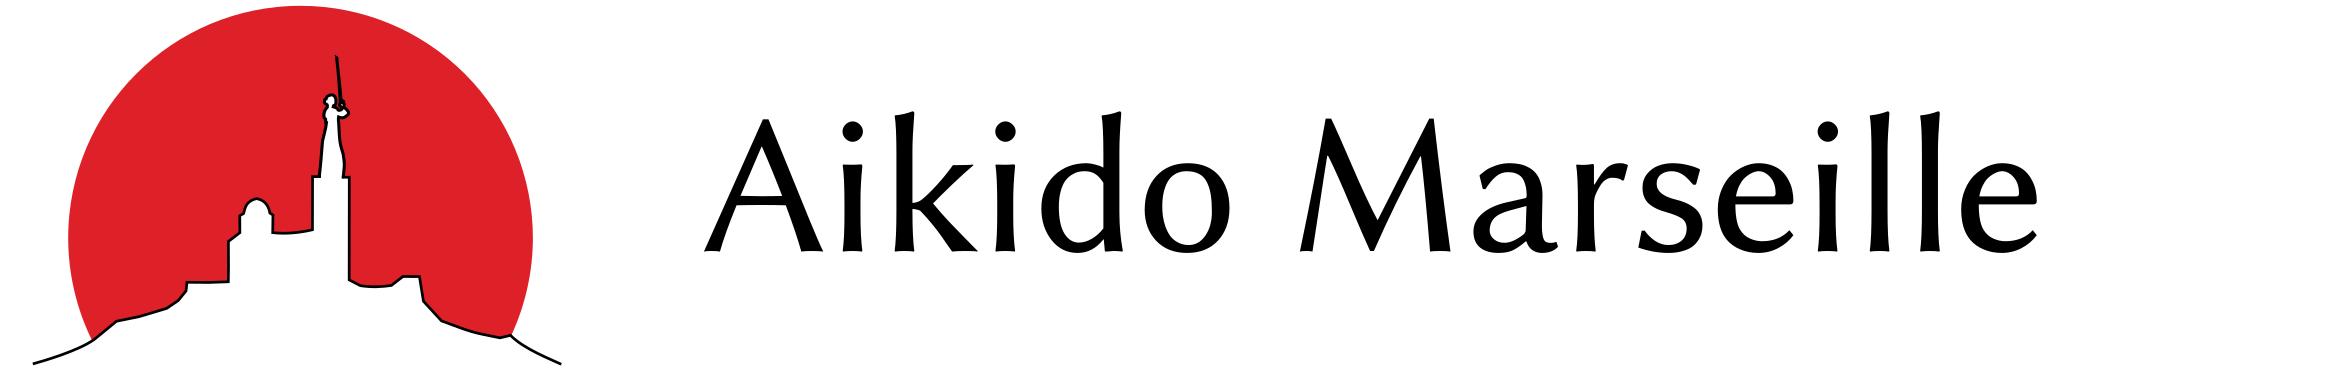 Aikido Marseille